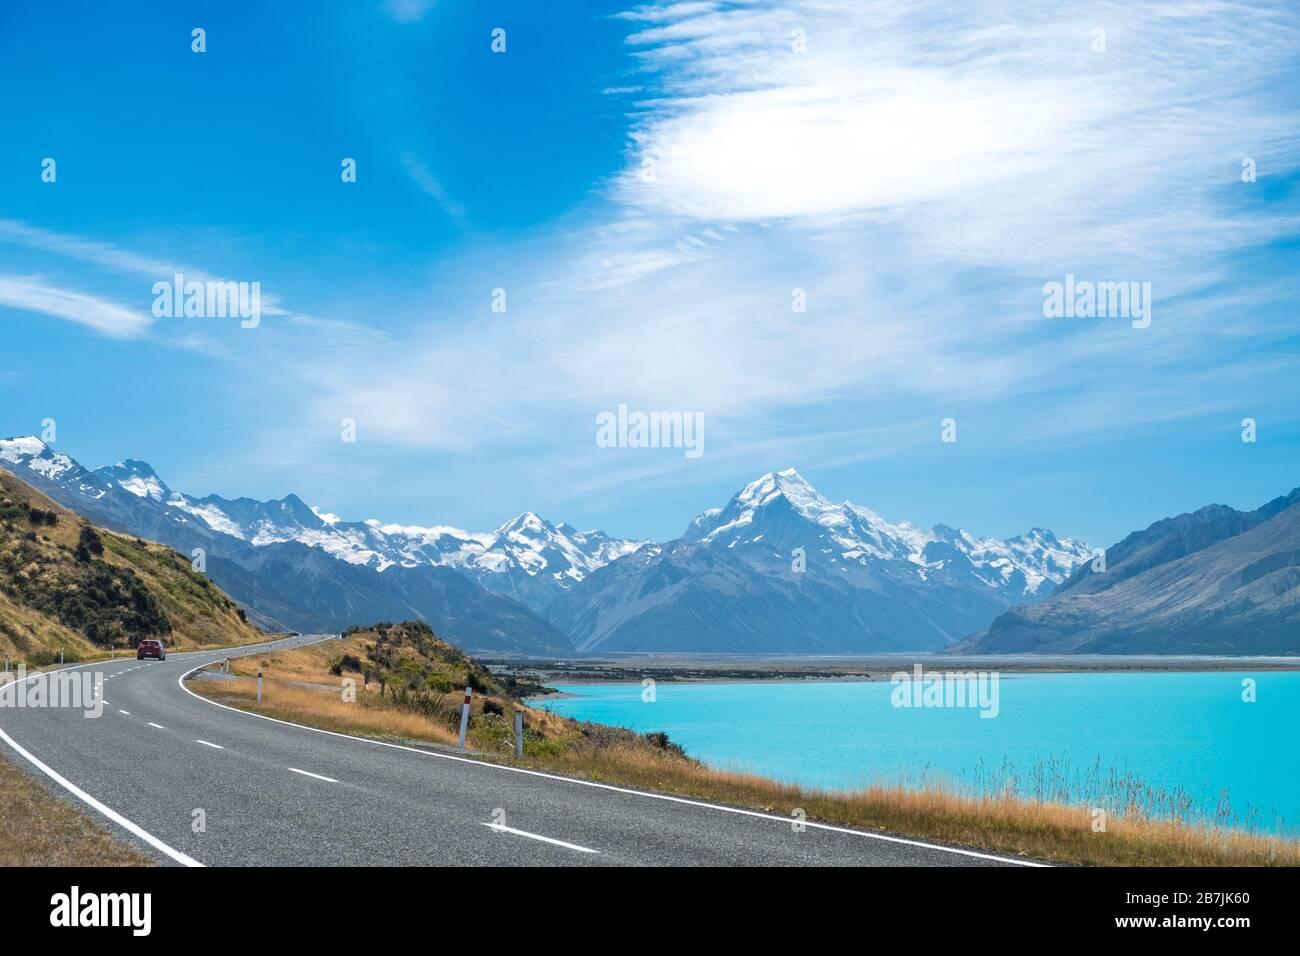 Straße und Lake Pukaki mit Blick auf den Mount Cook National Park, South Island, Neuseeland Stockfoto